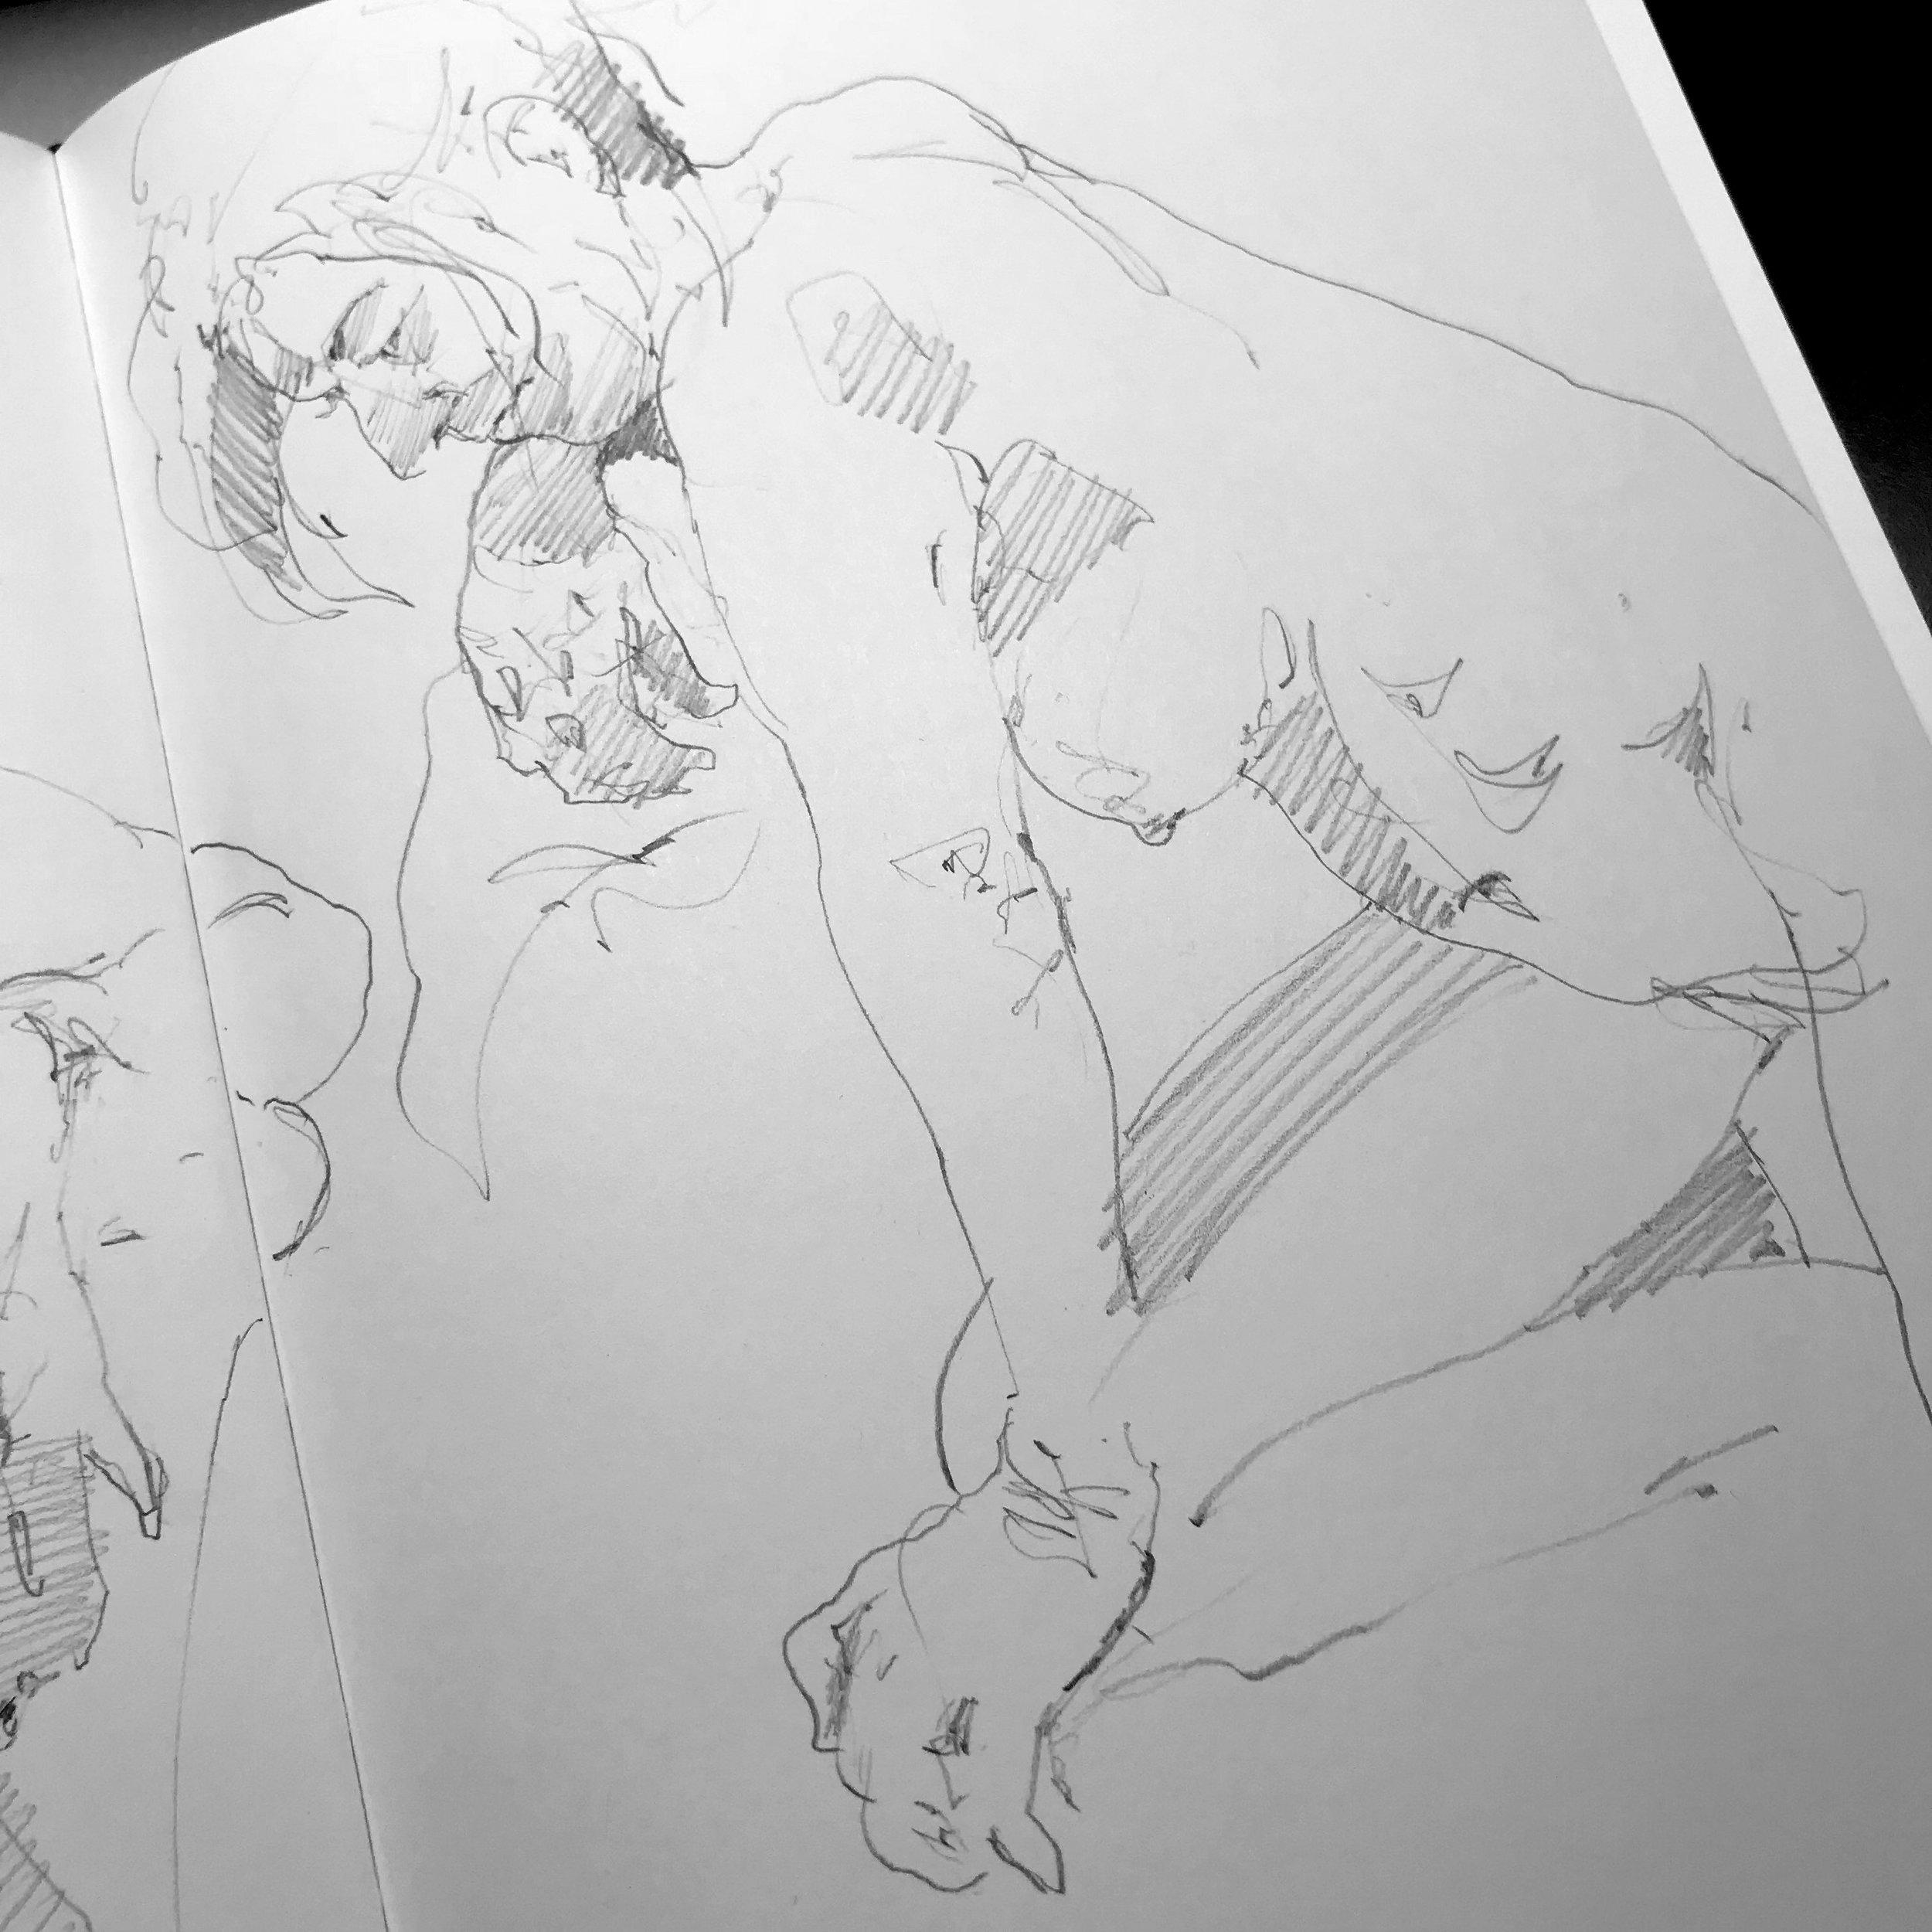 10 minute sketch